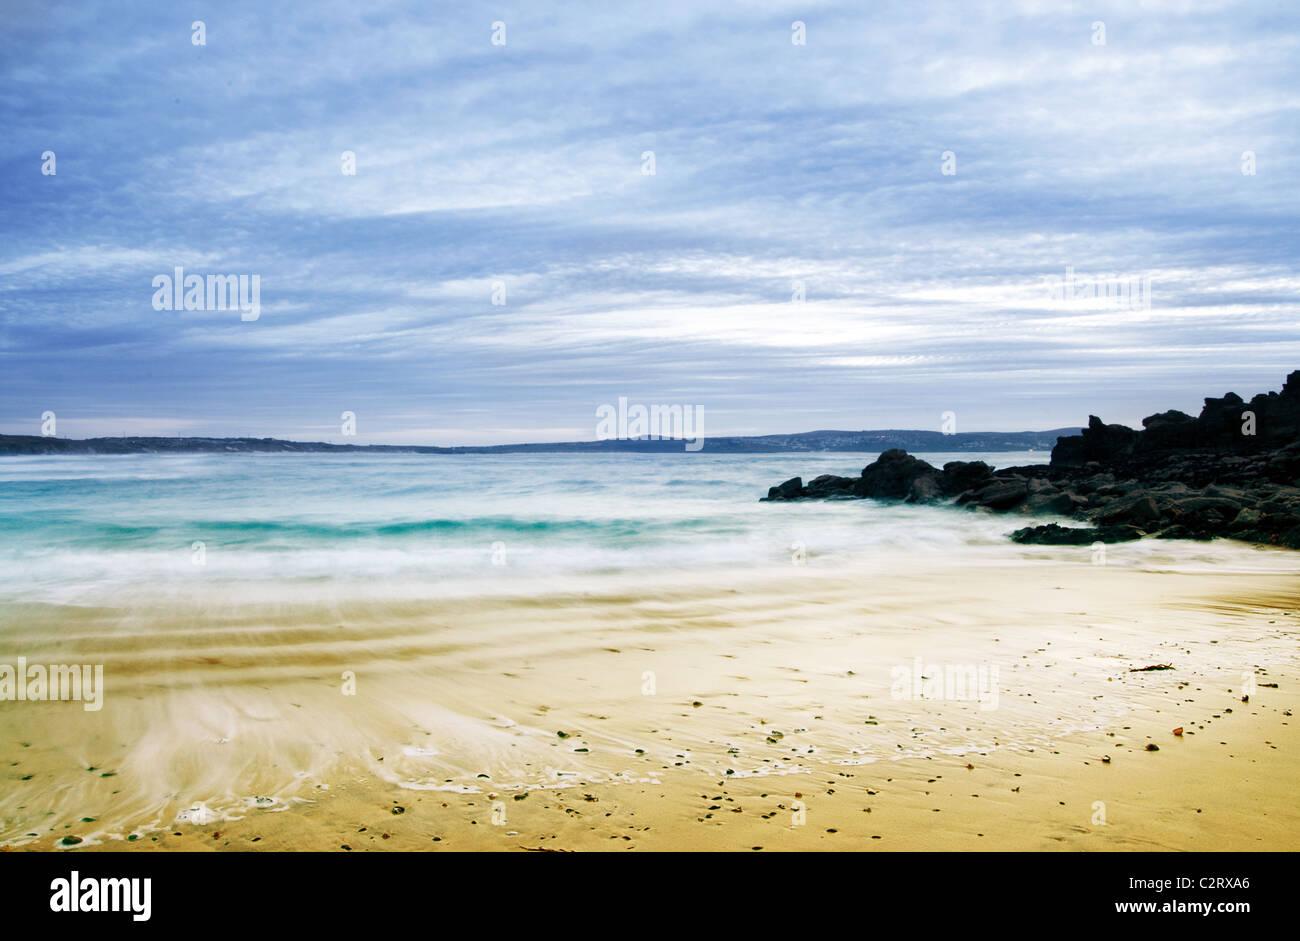 Summer beach - Stock Image